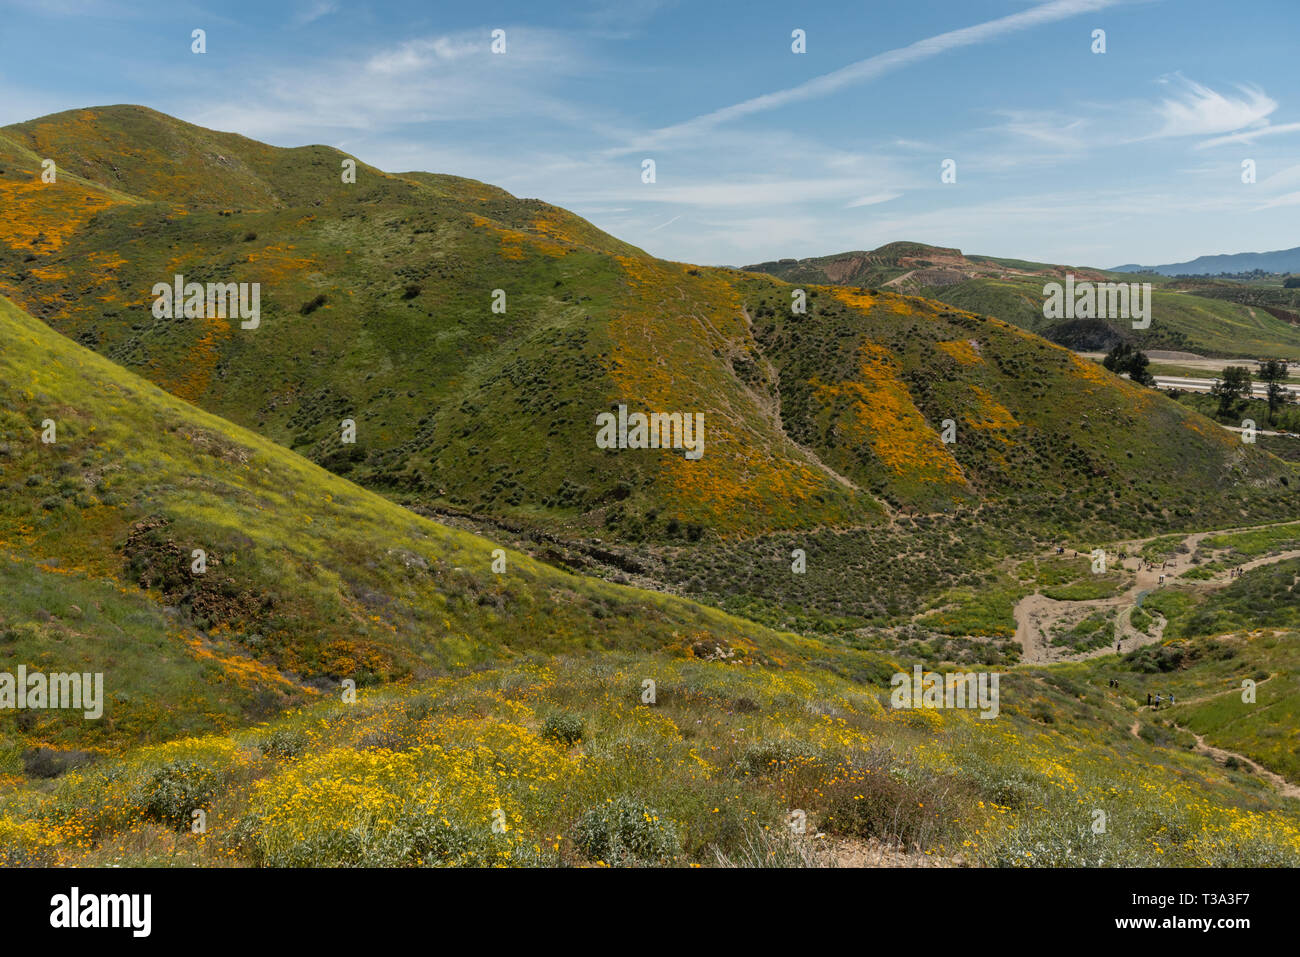 Beautiful superbloom vista in a mountain range near Lake Elsinore, Southern California - Stock Image